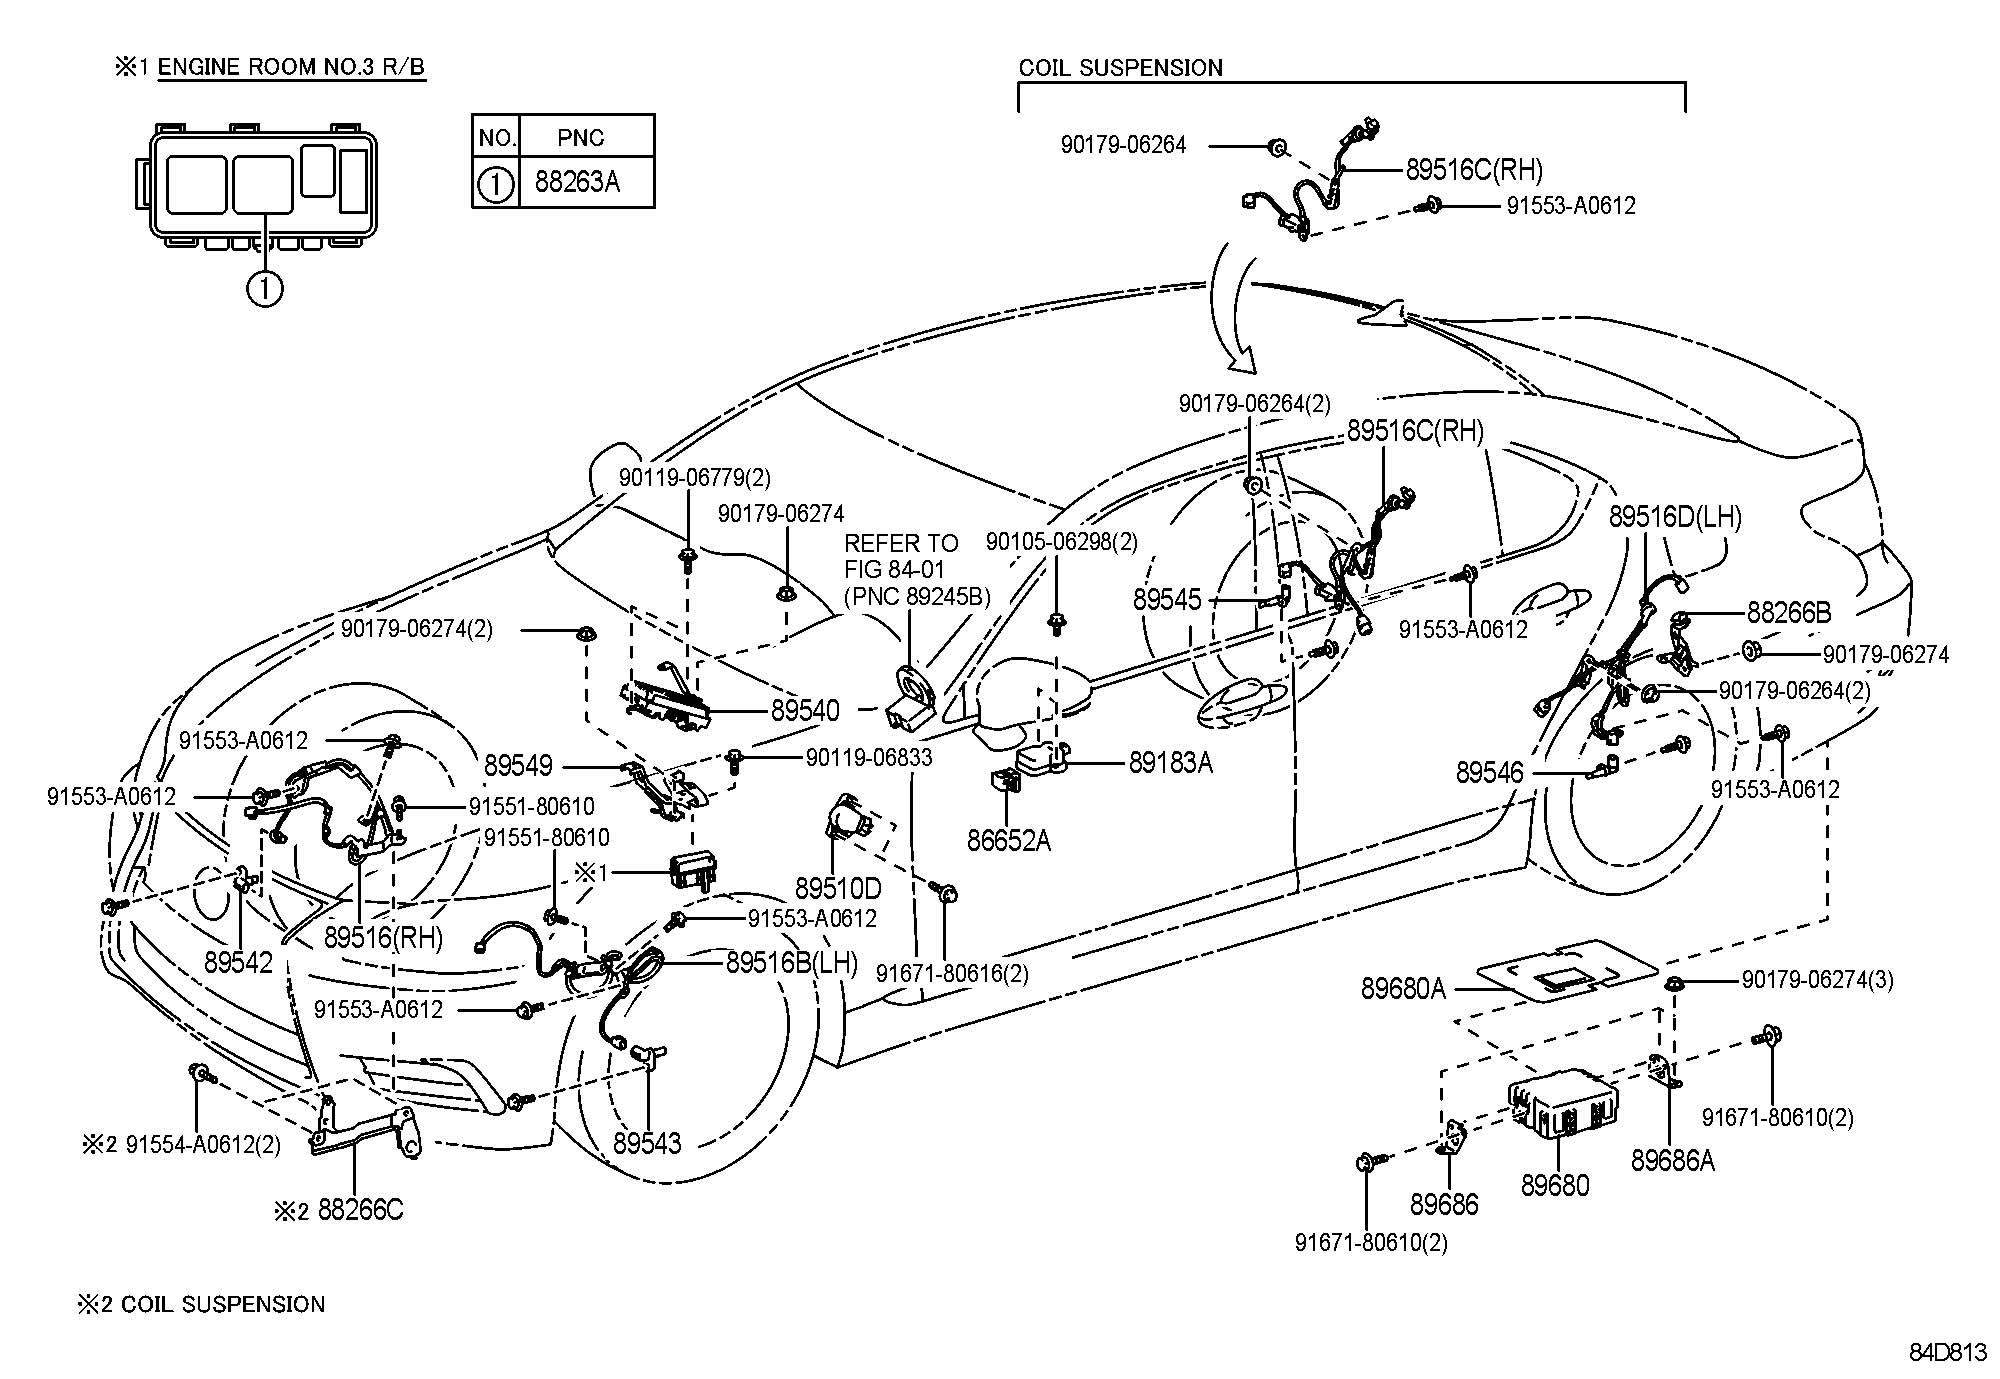 Honda Rc51 Wiring Diagram - free download wiring diagrams